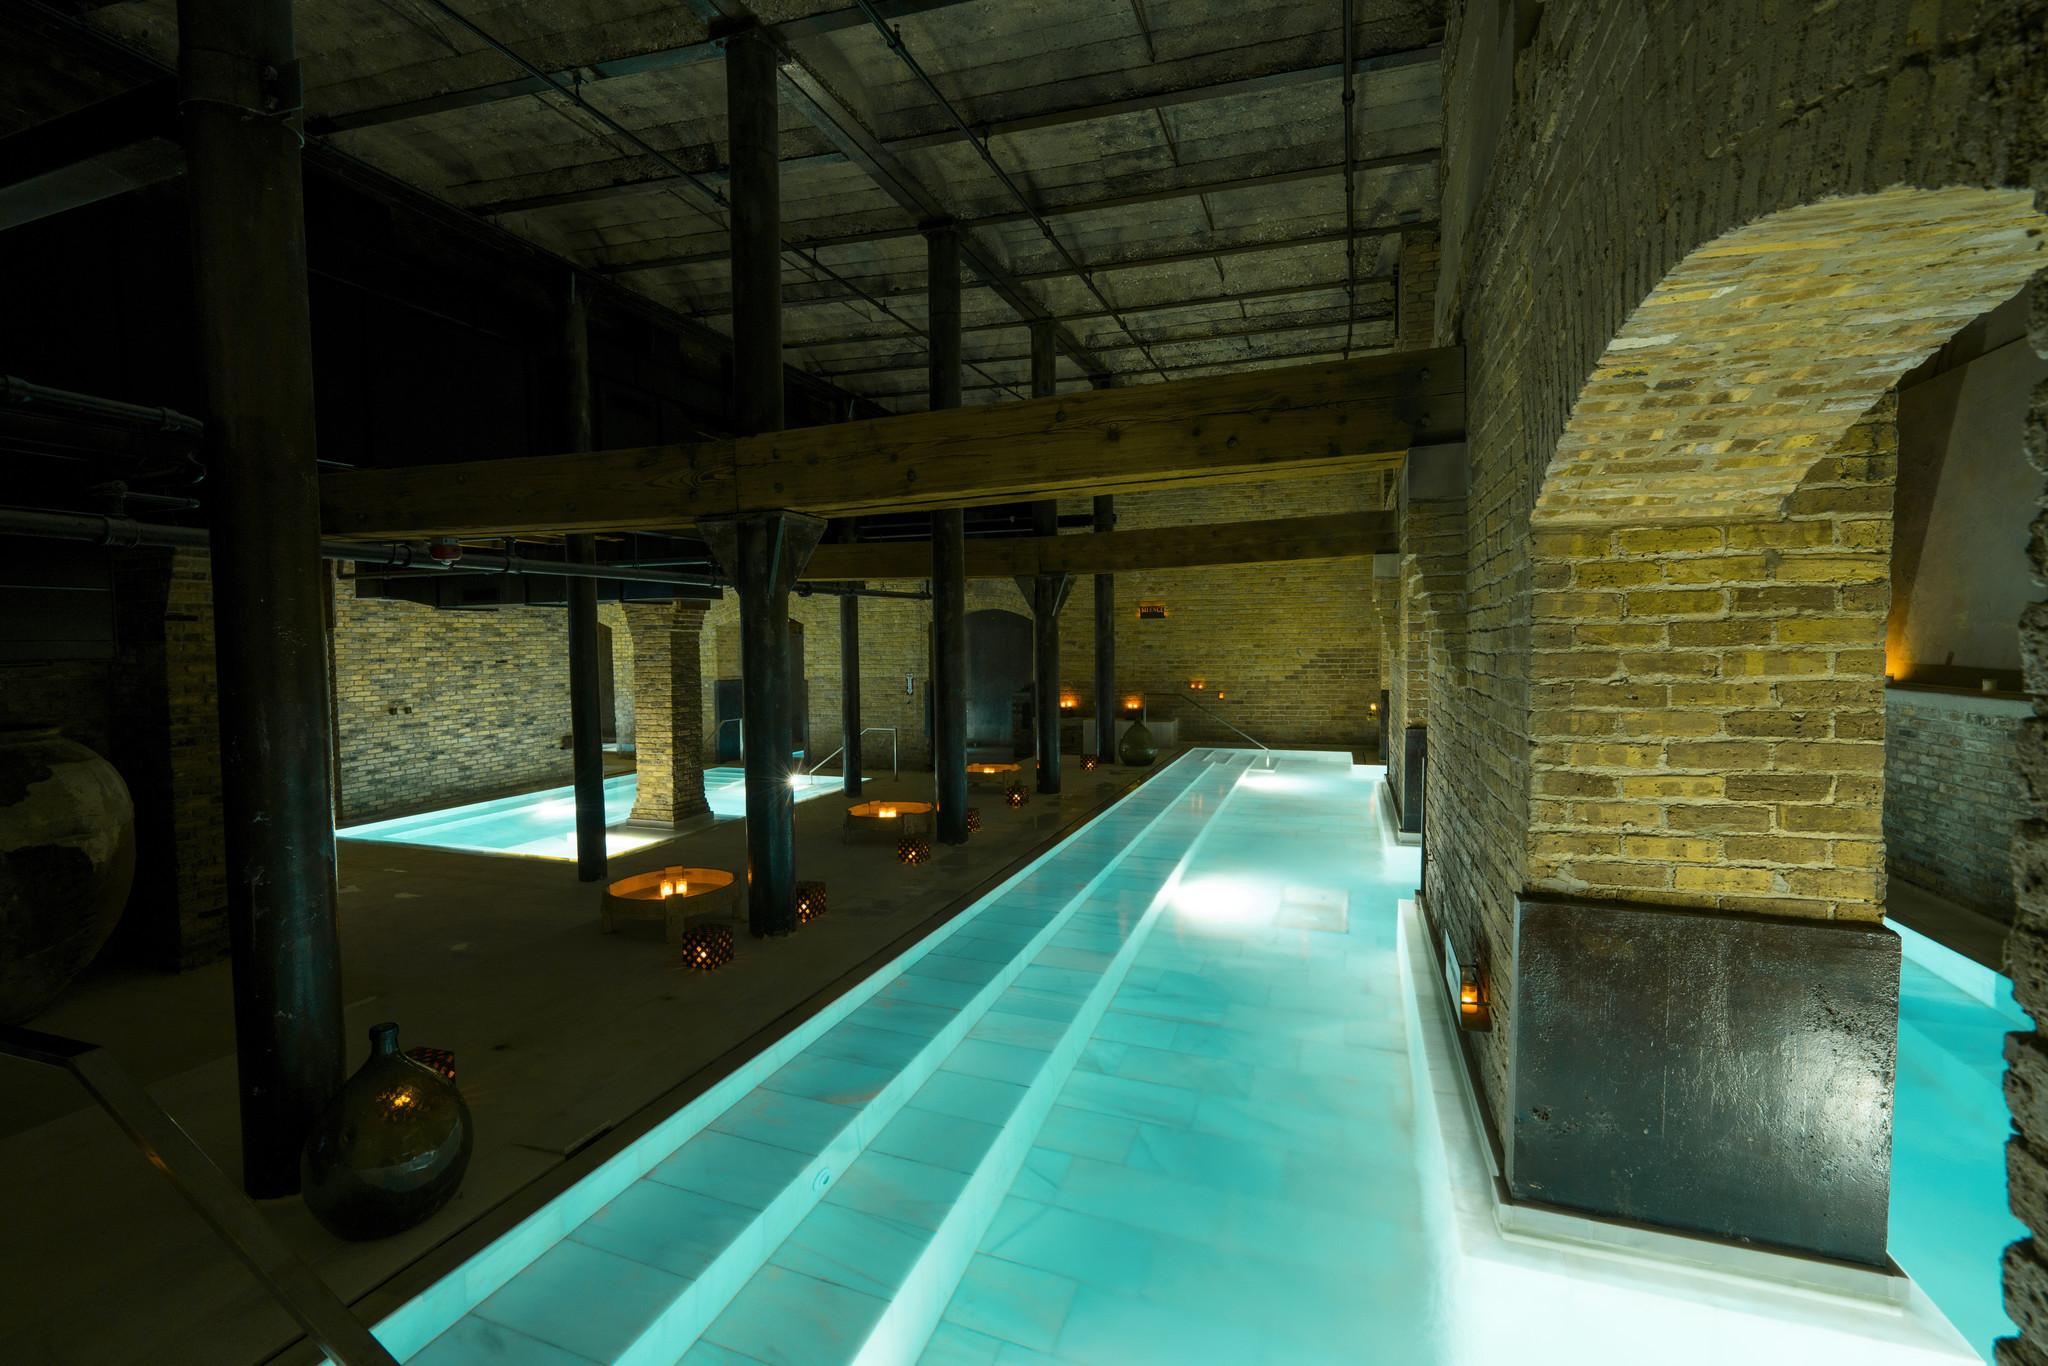 Roman Baths Home Design Html on sauna home, quote home, england home, steam room home, gym home,